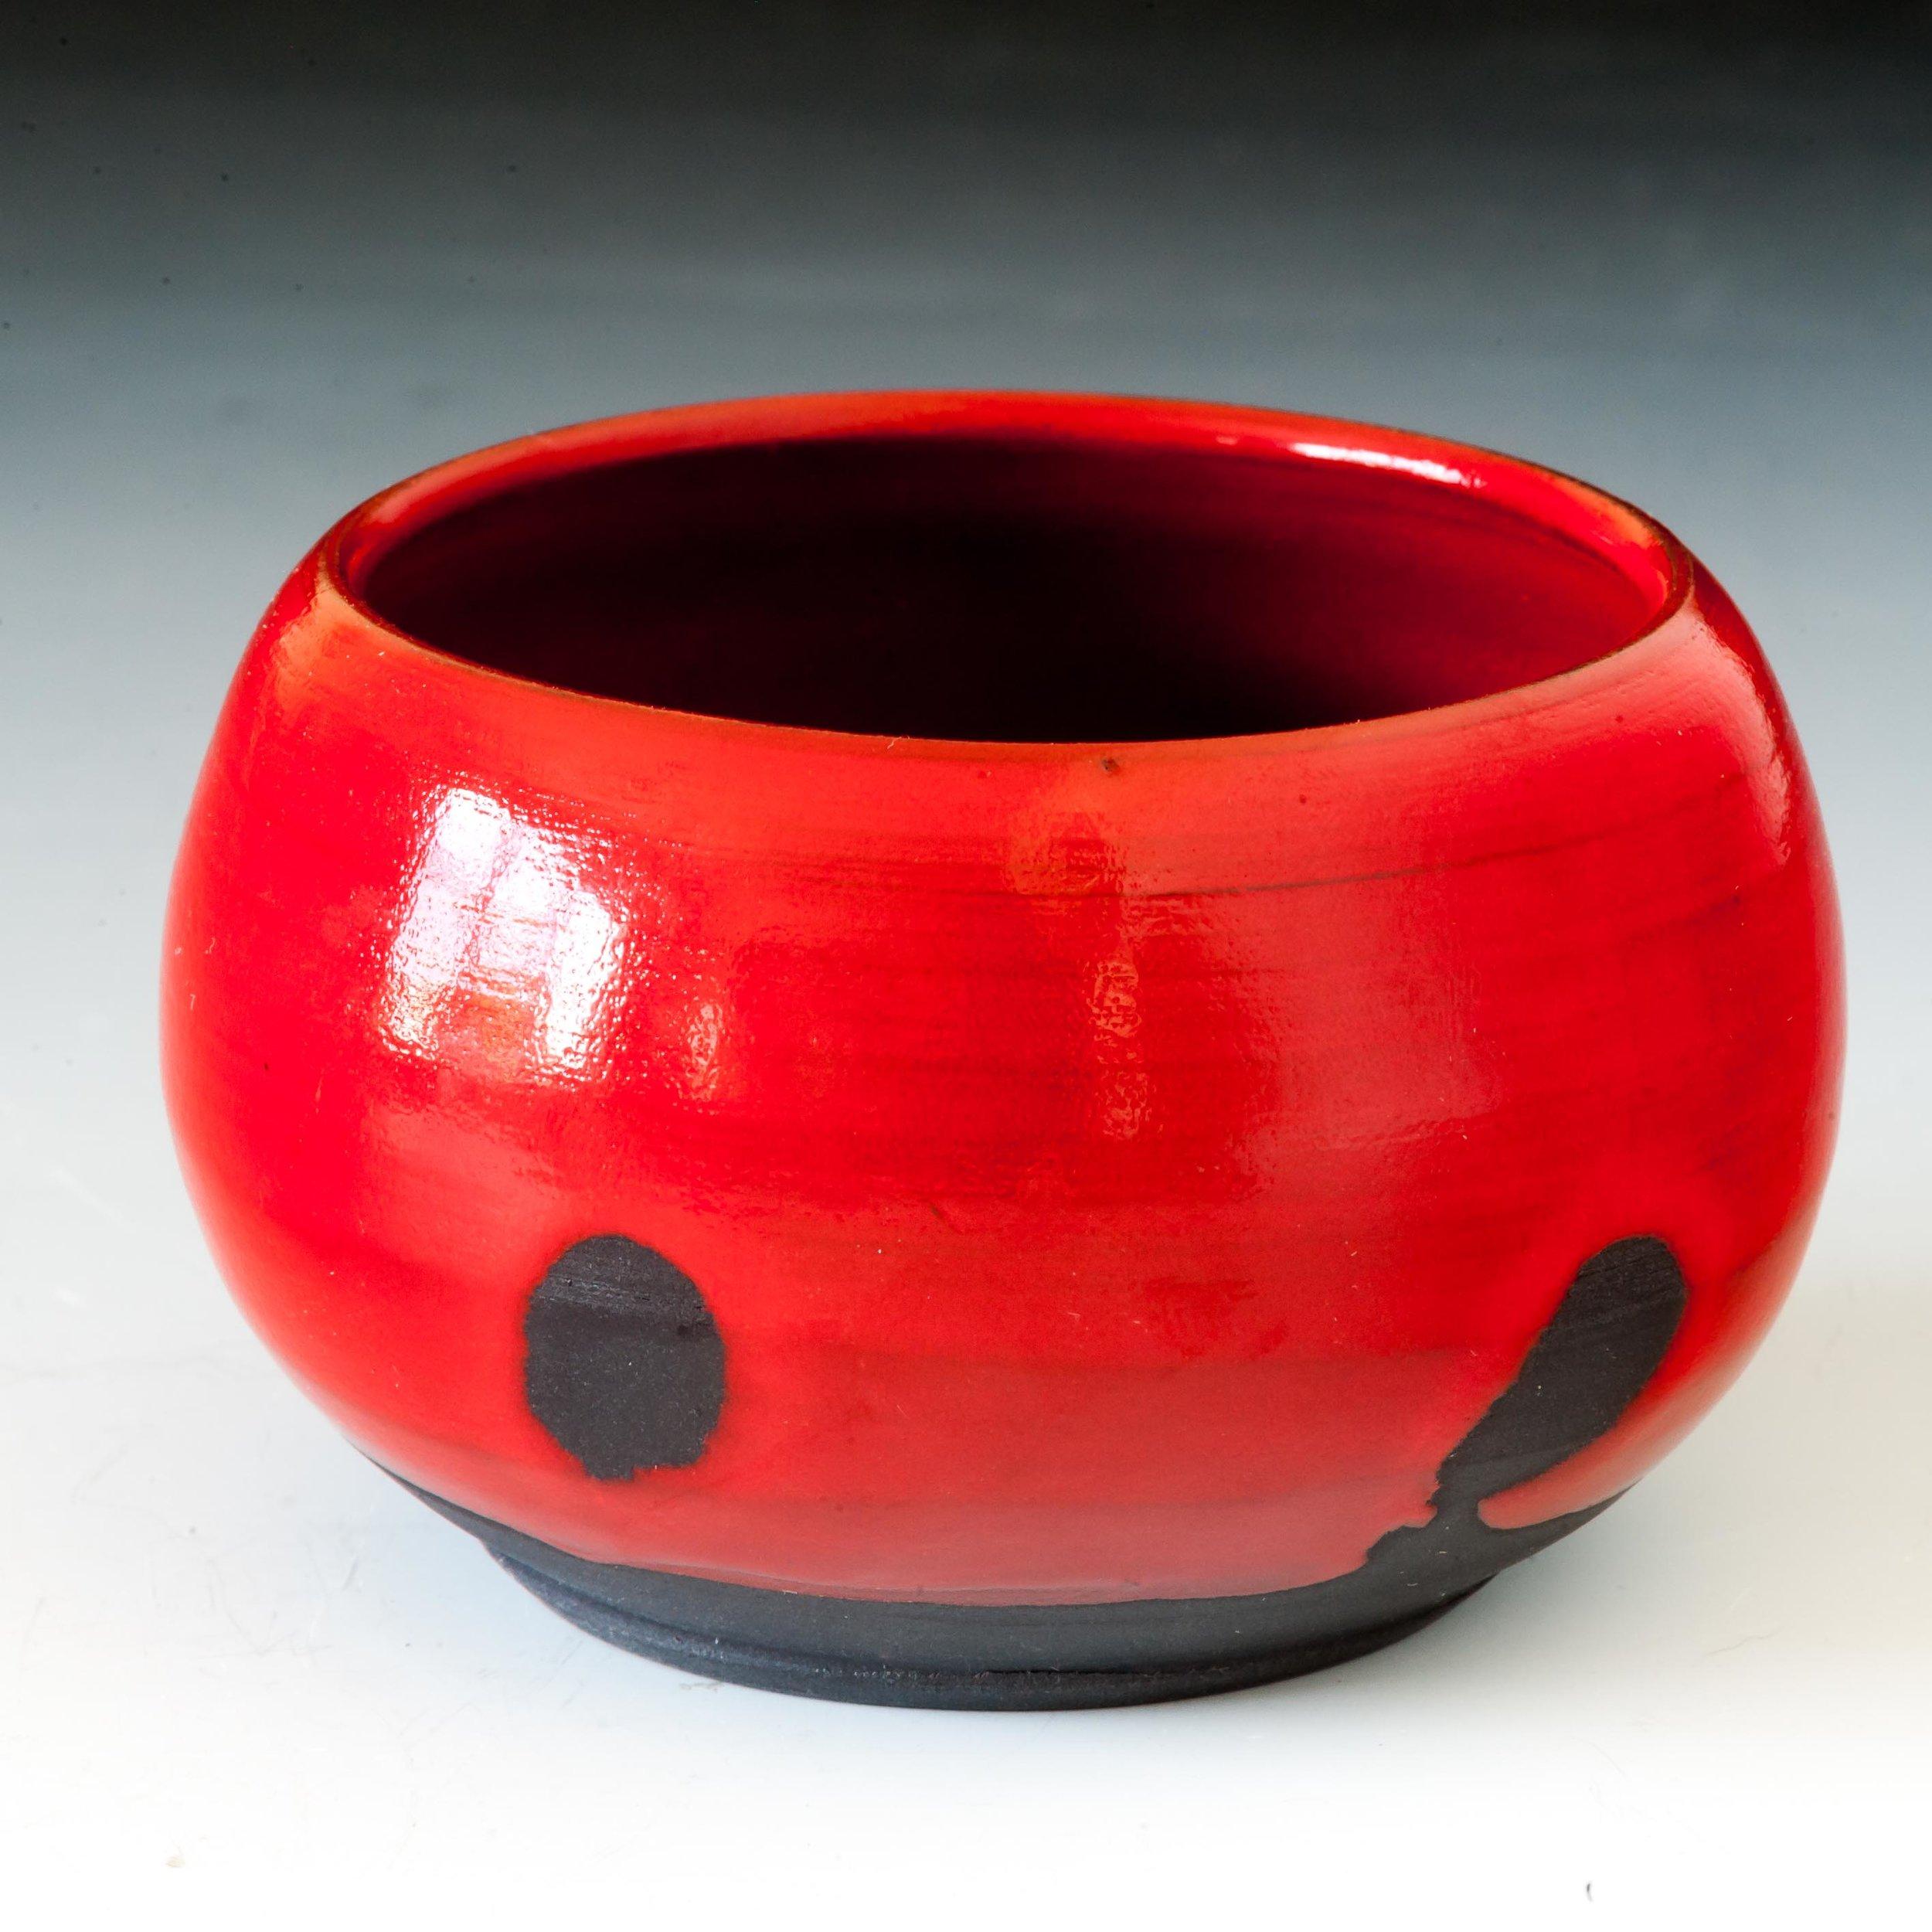 cups on gradient-3304.jpg